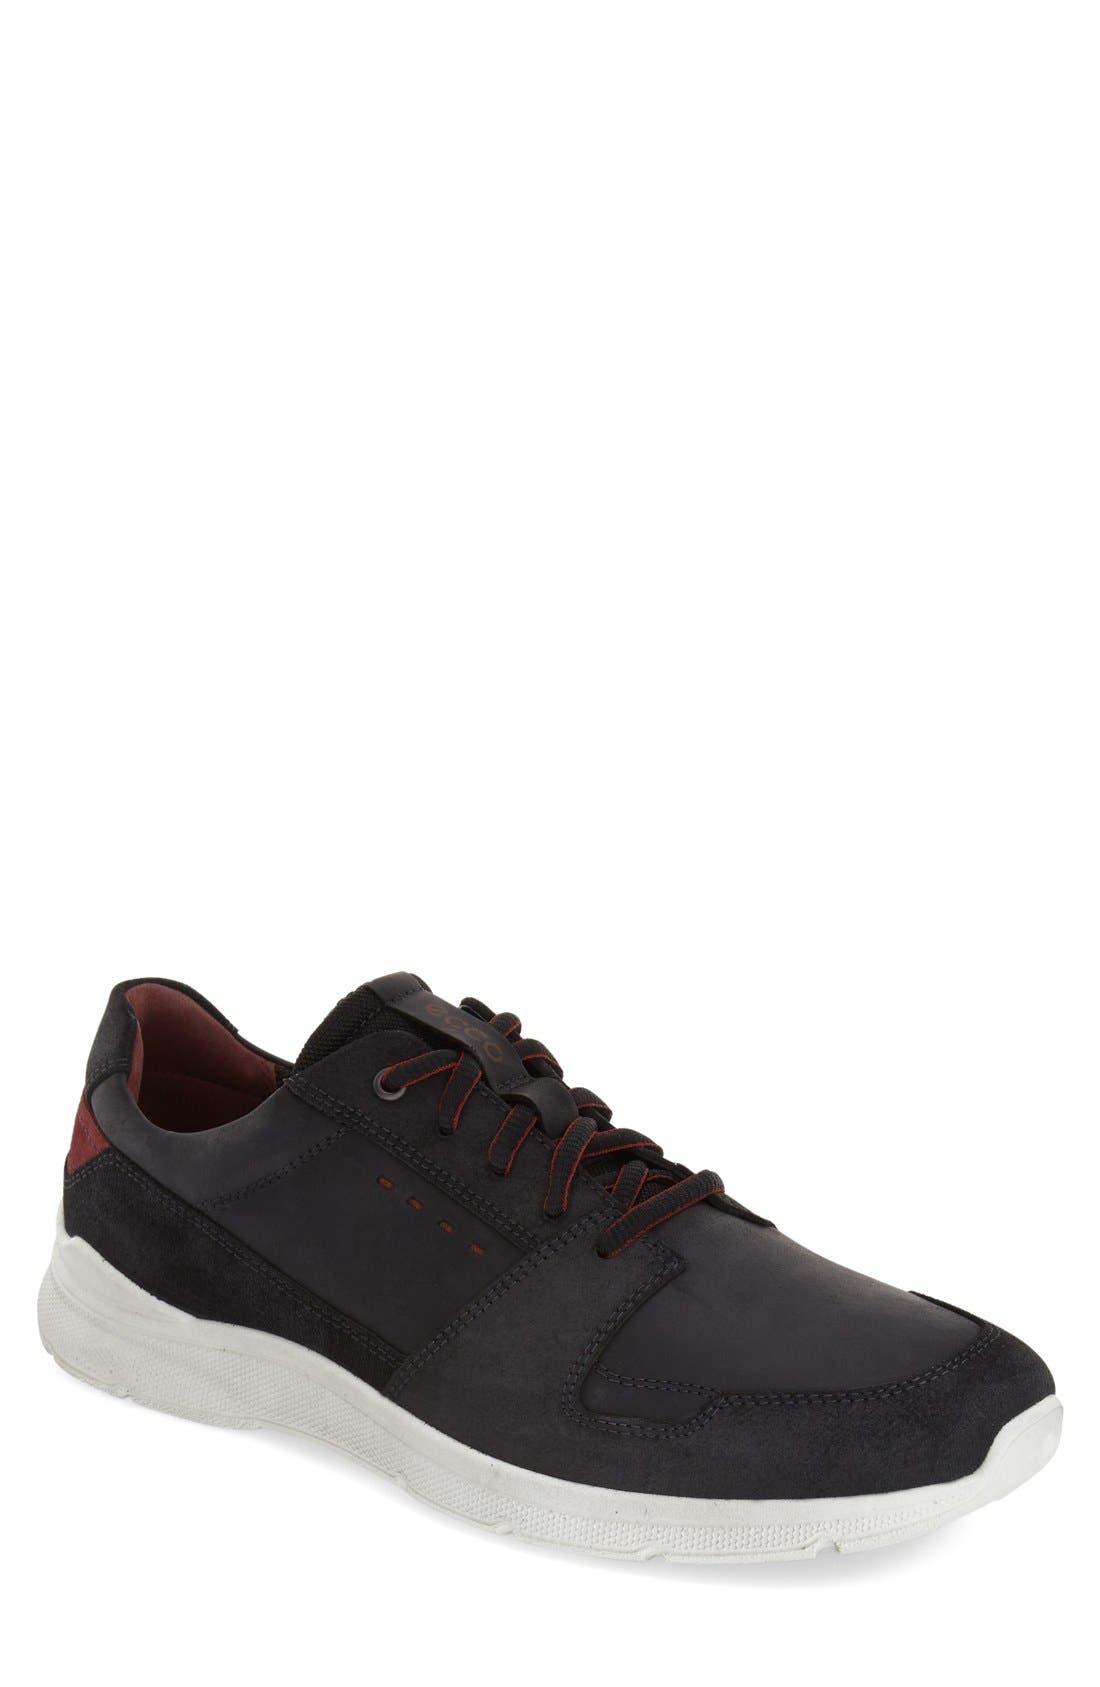 'Irondale - Retro' Sneaker,                             Main thumbnail 1, color,                             001